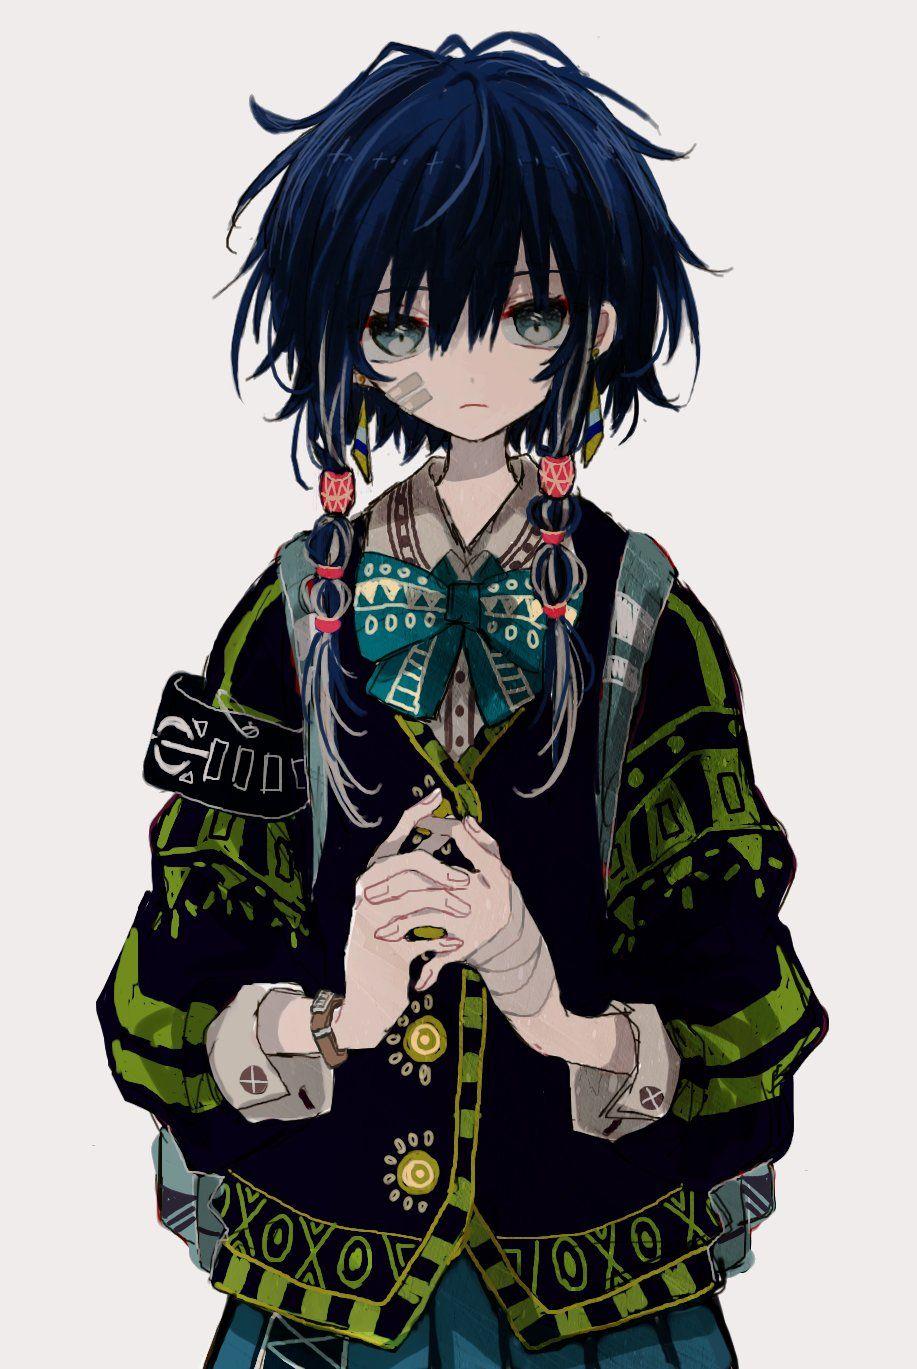 Az Zzz On Twitter Anime Chibi Anime Art Anime Angel